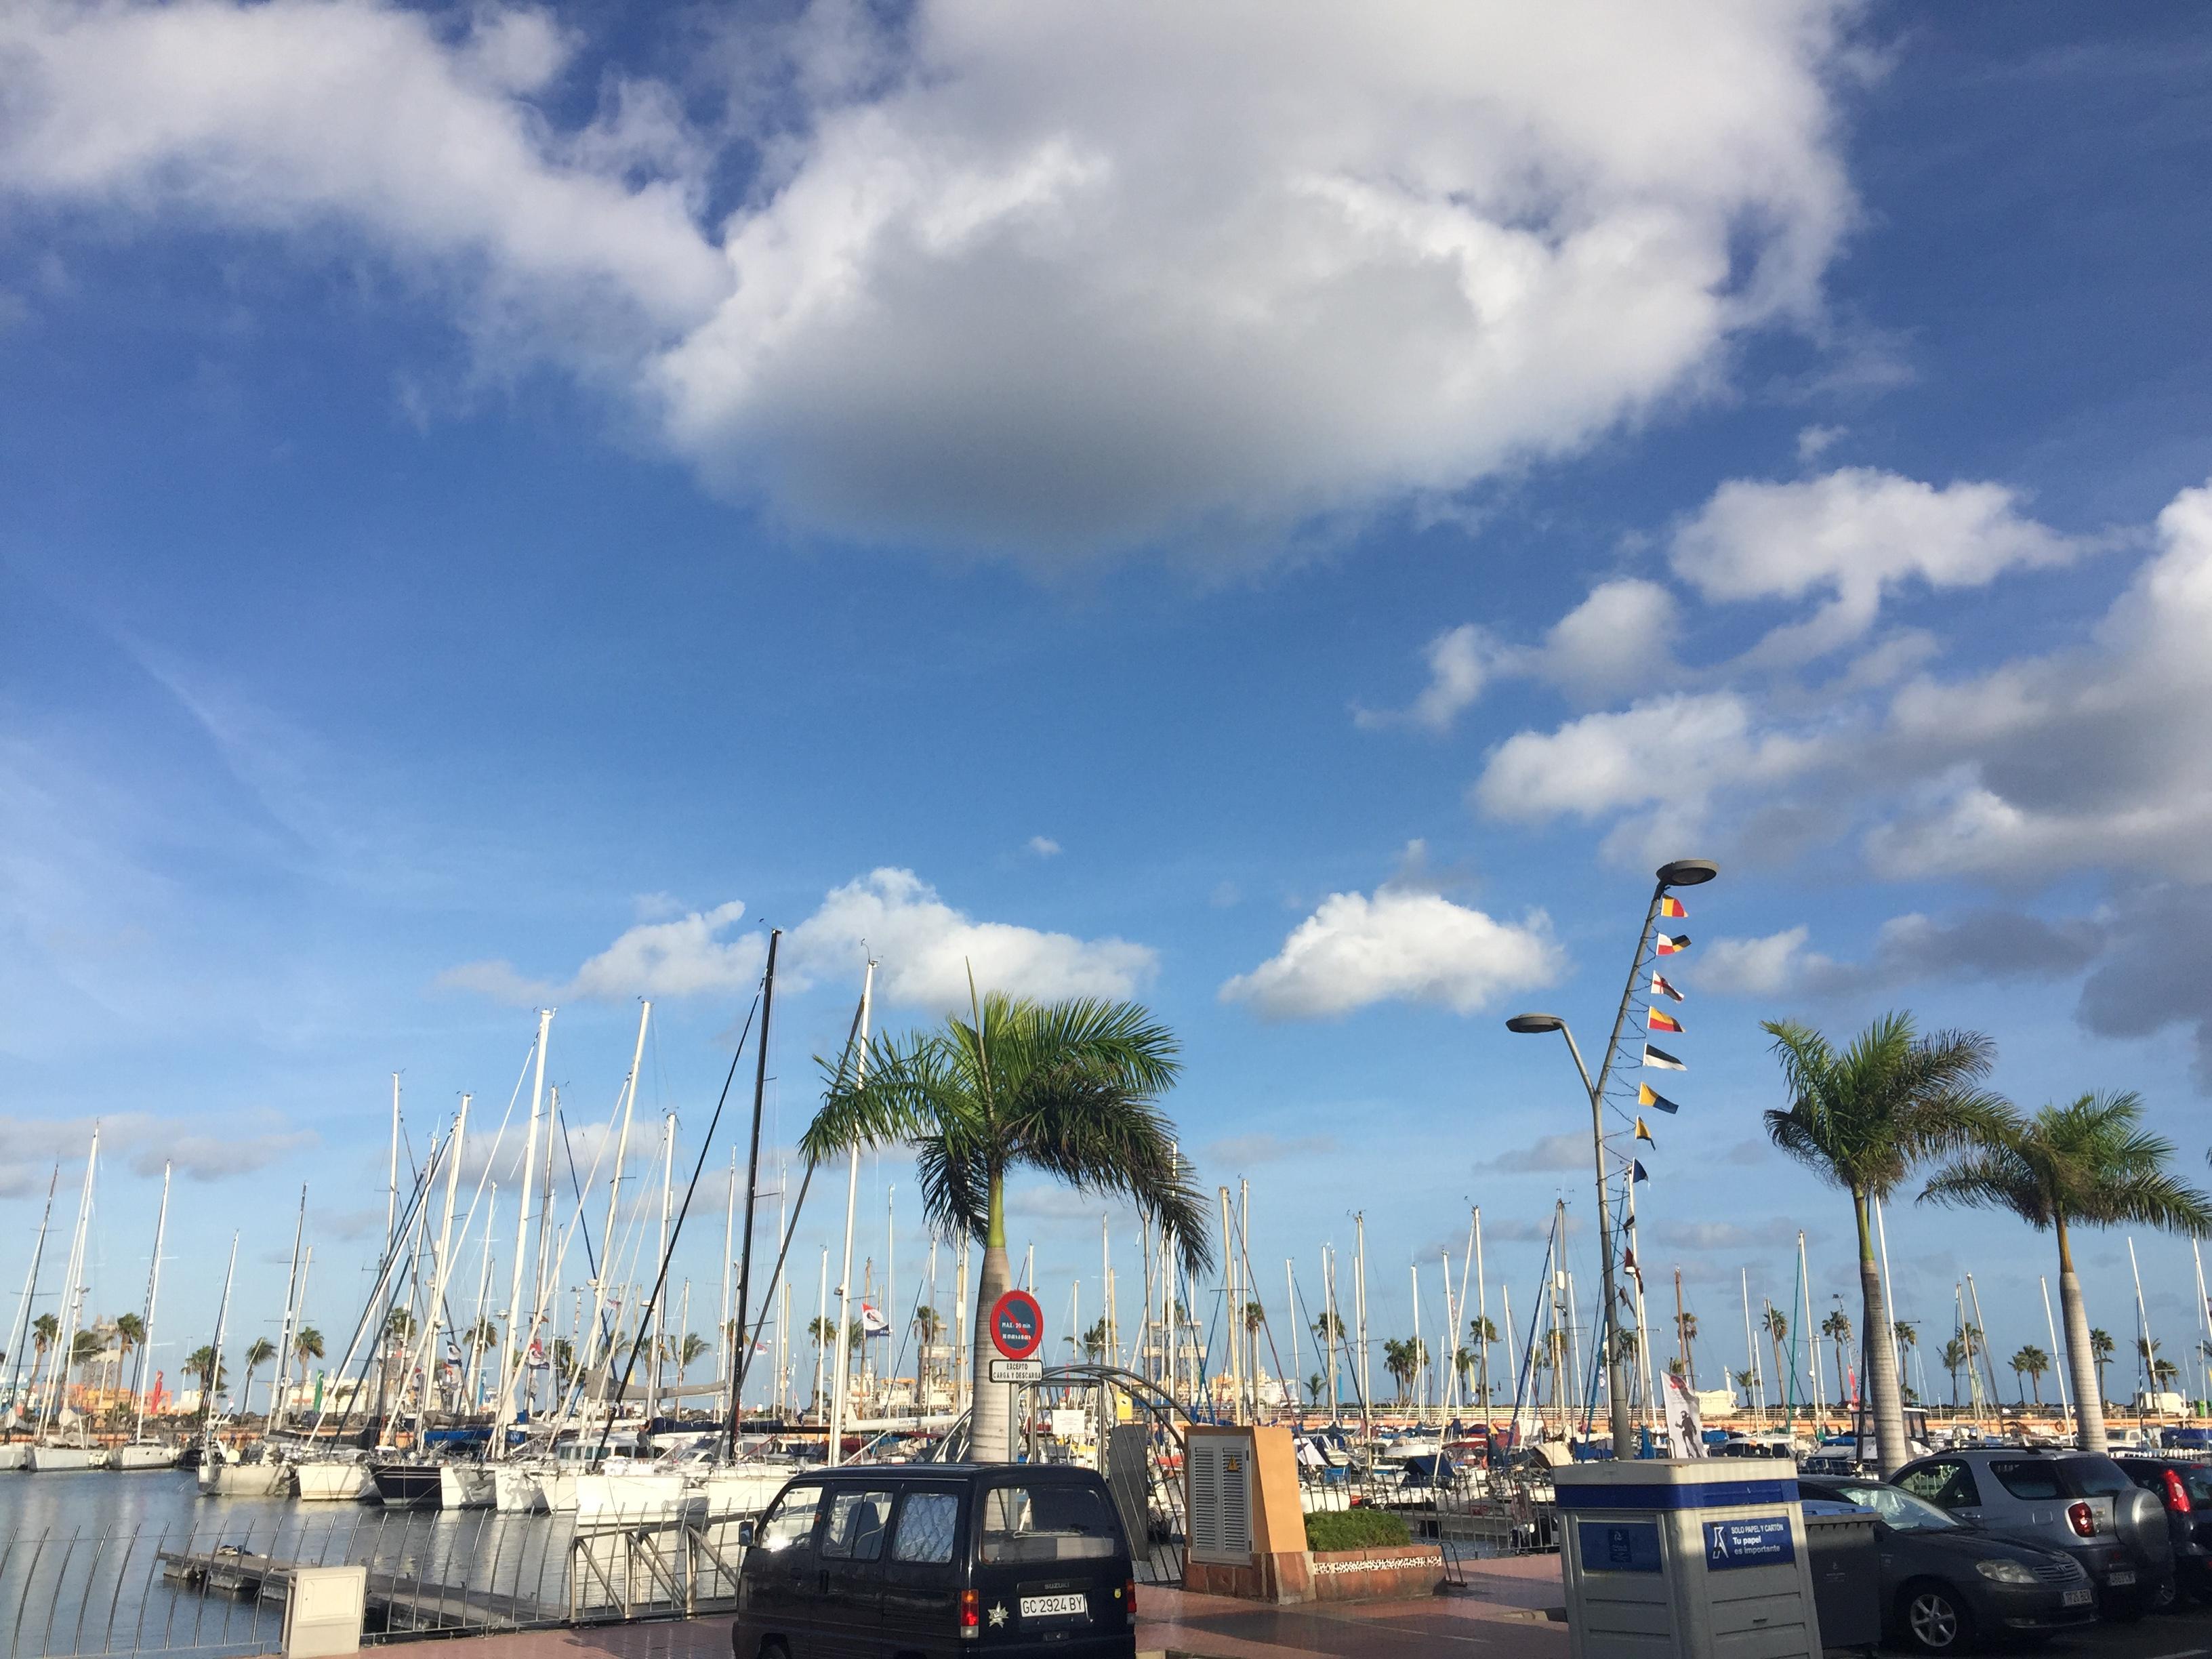 ARC+ Muelle Deportivo Marina